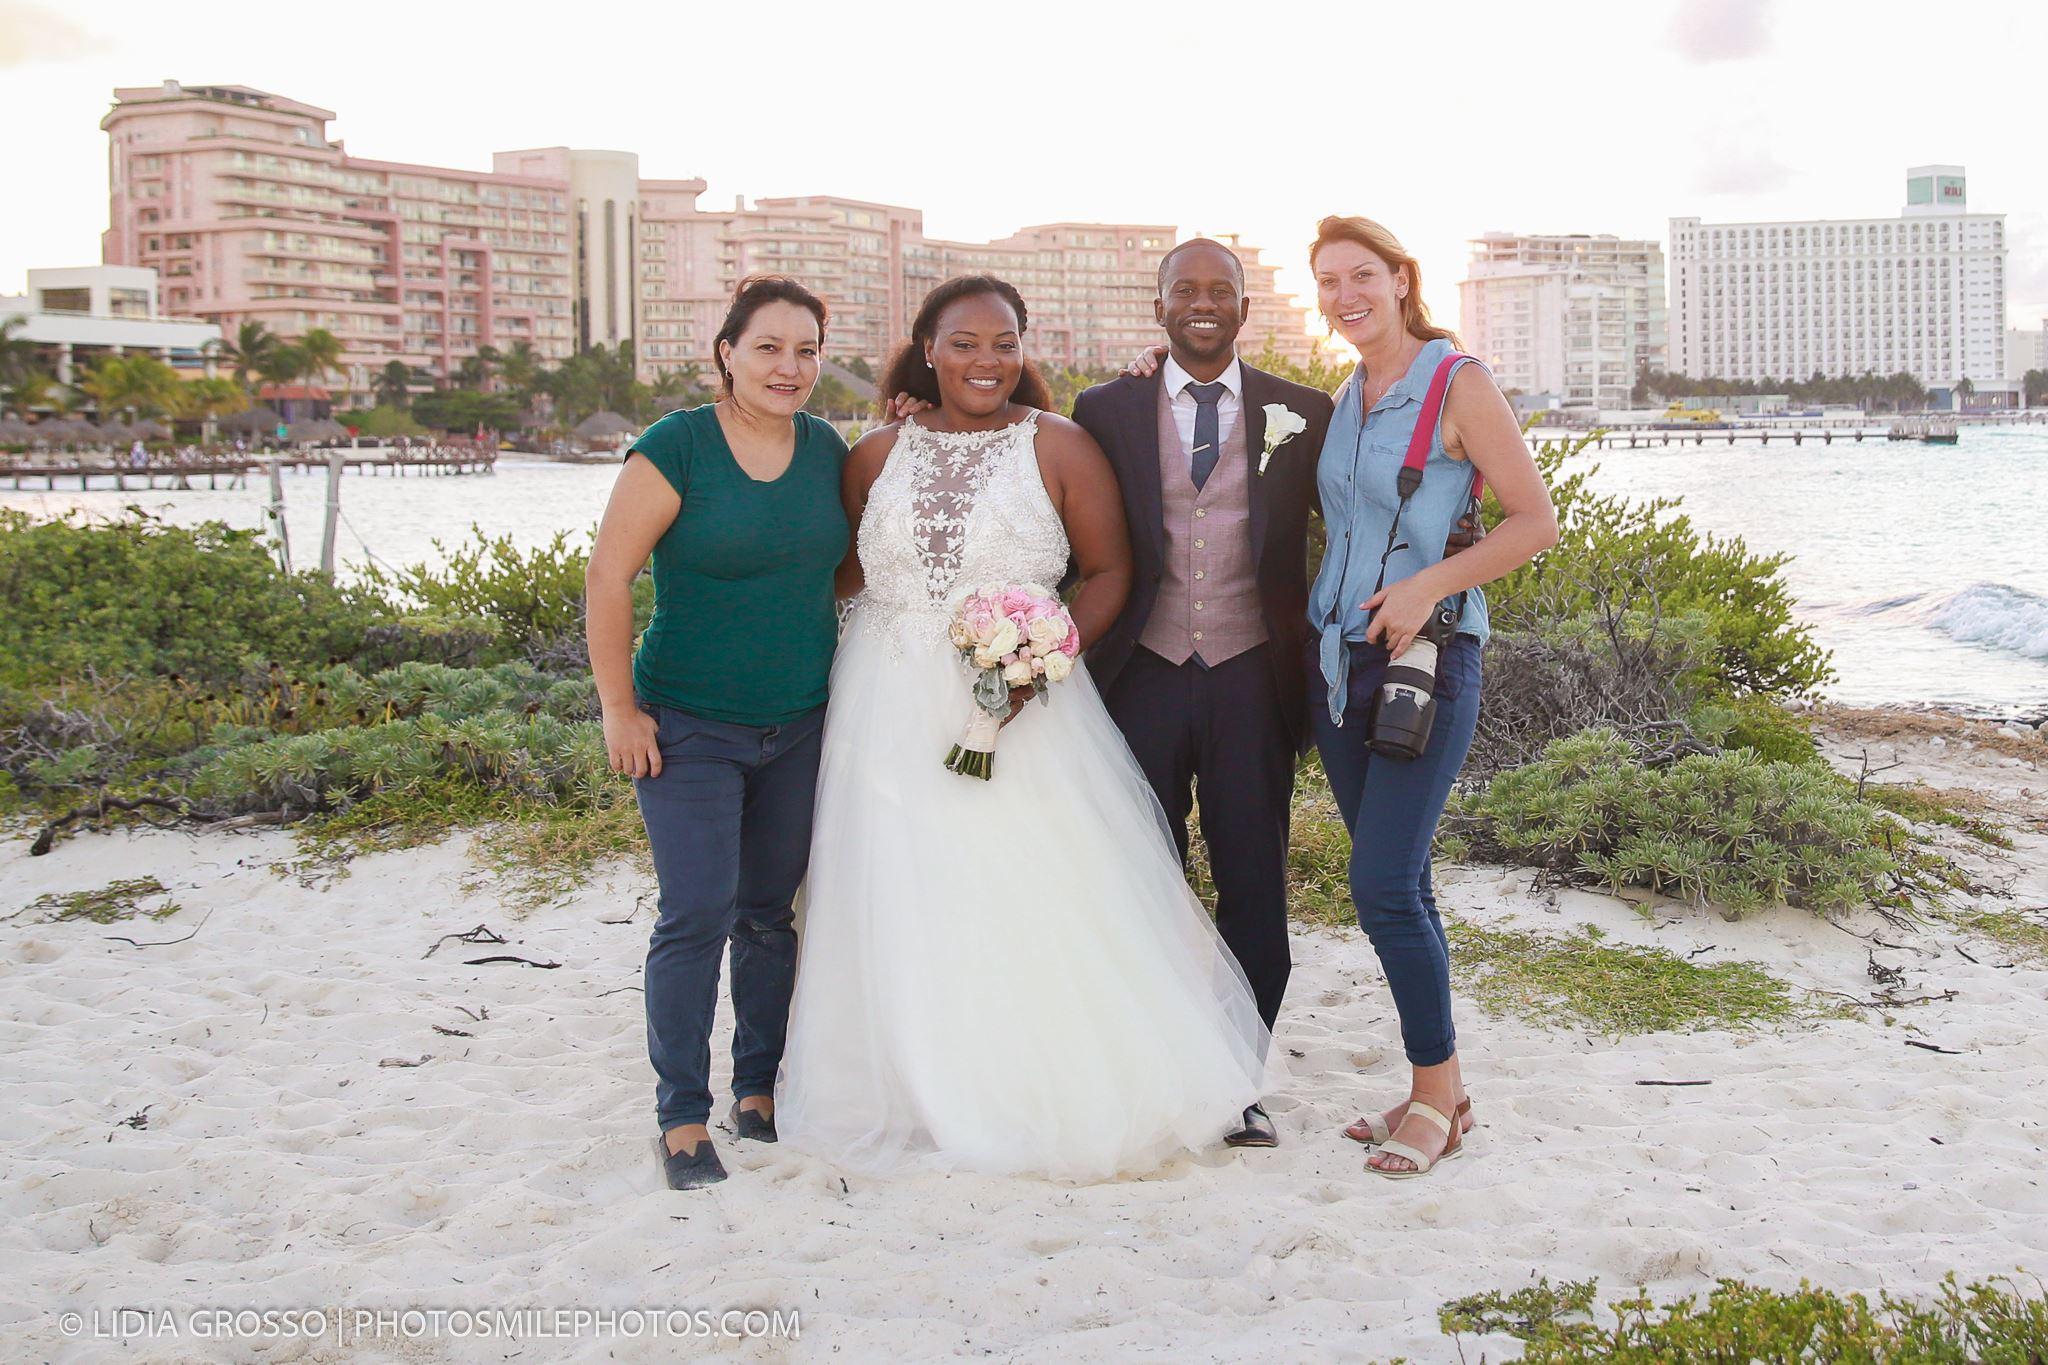 cancun wedding photos, a day after session photos, Hyatt Ziva Cancun wedding photographer, fotografo matrimoni, photosmile cancun team